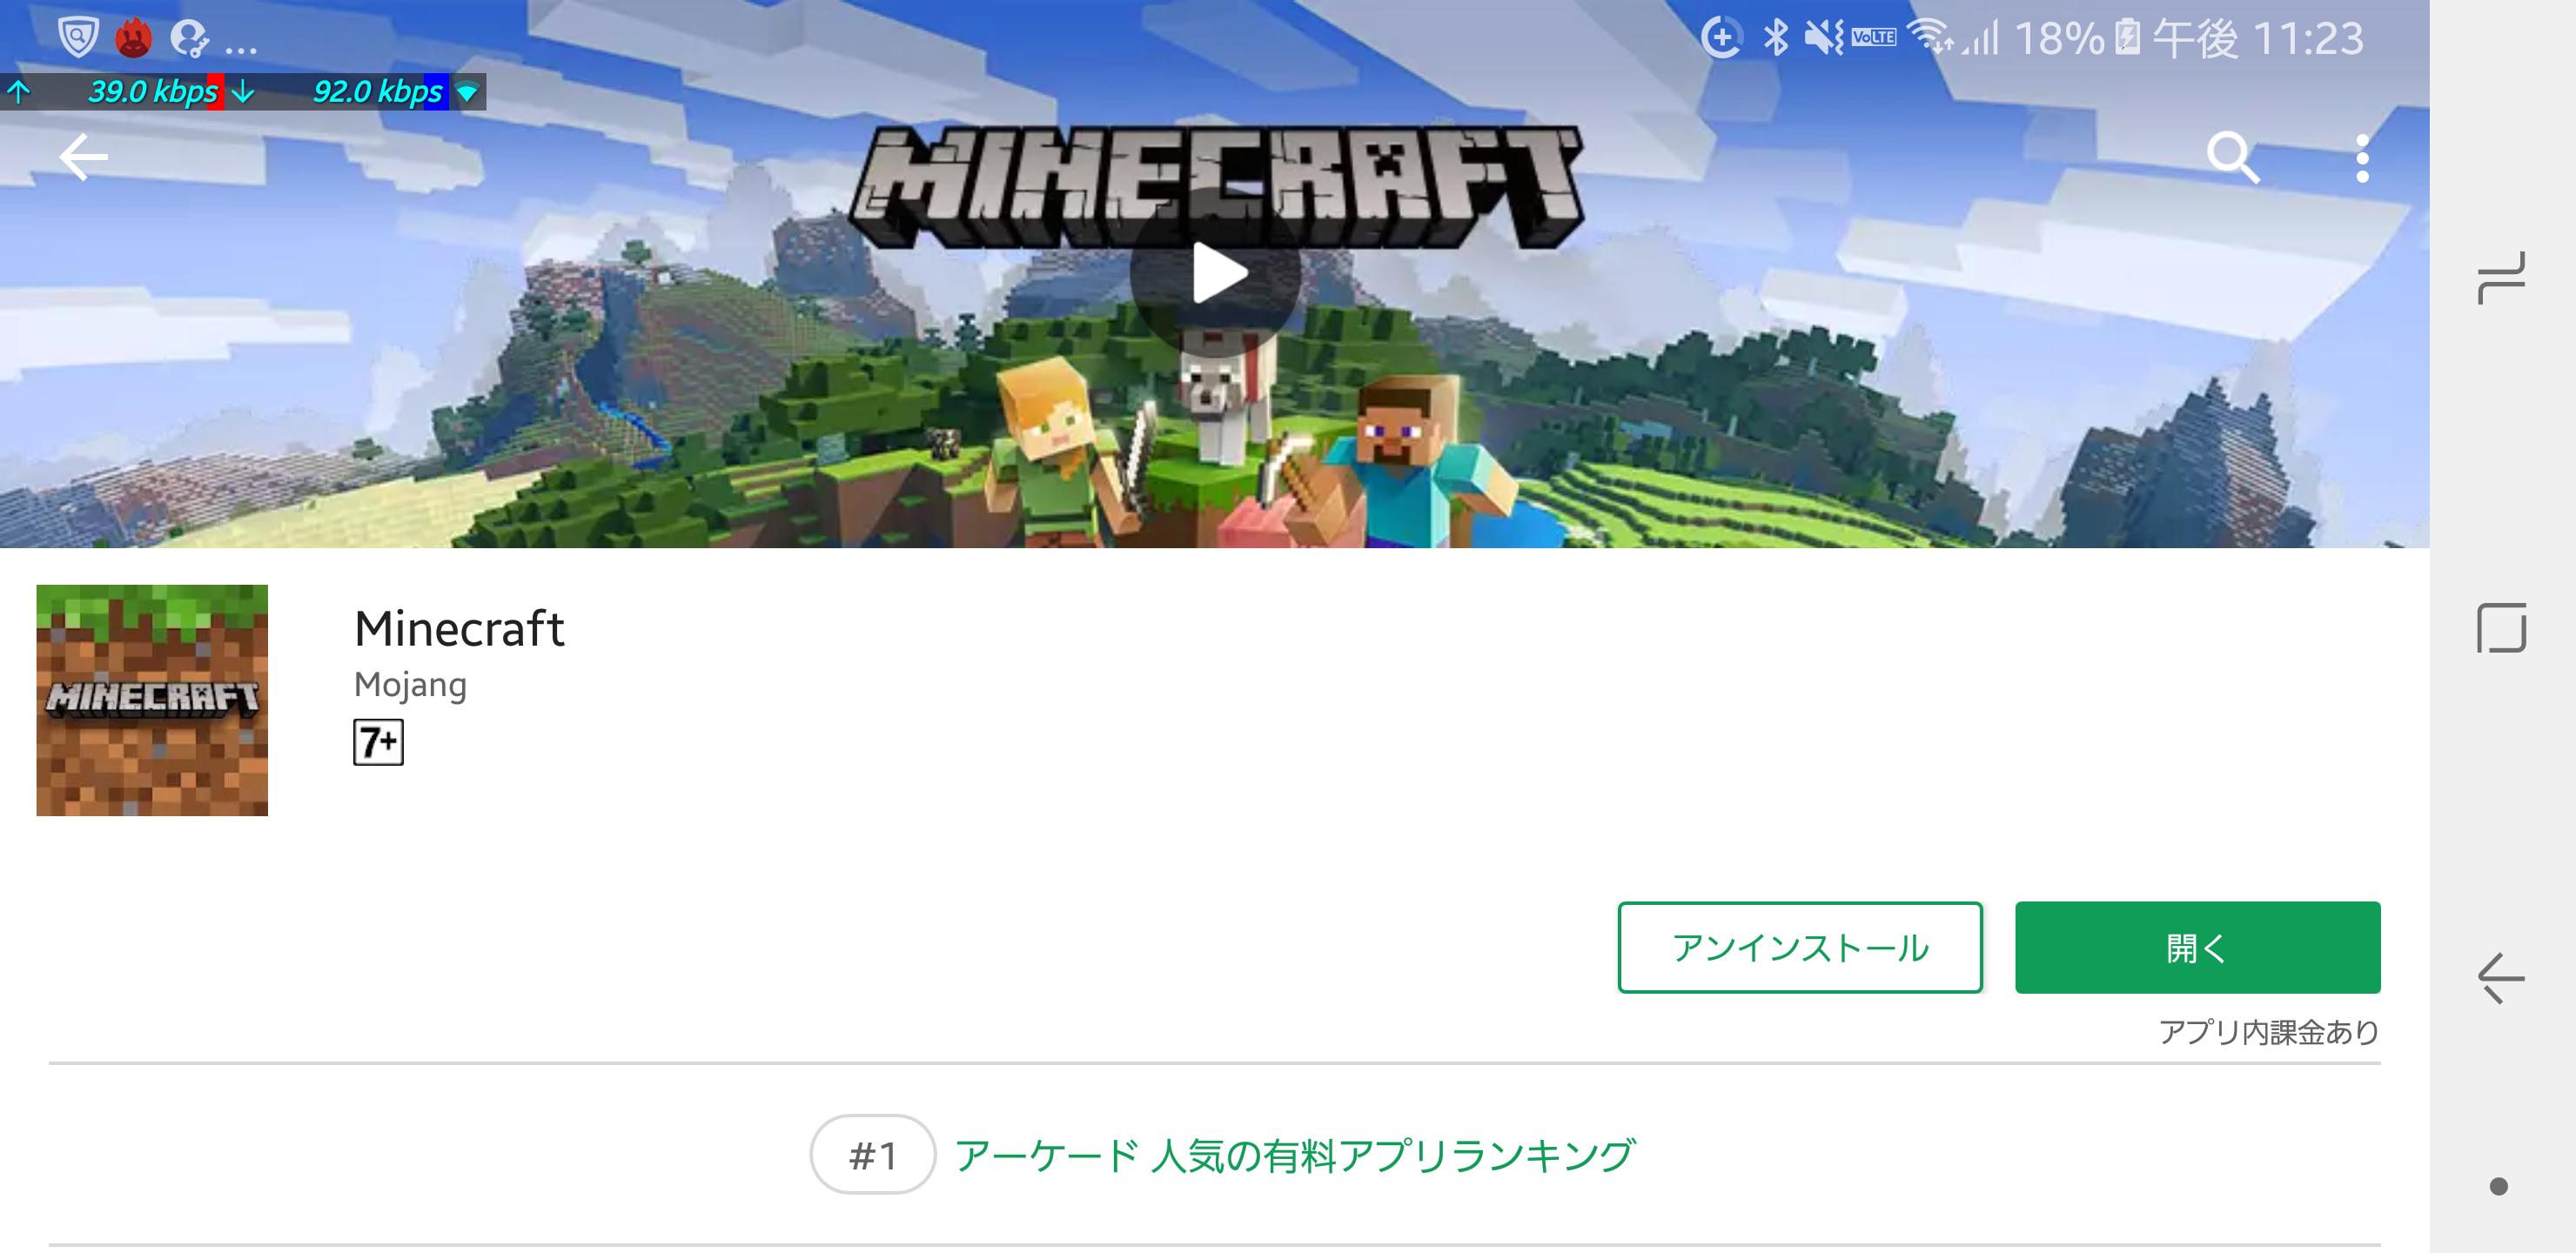 download apk minecraft pe 1.2.11.4